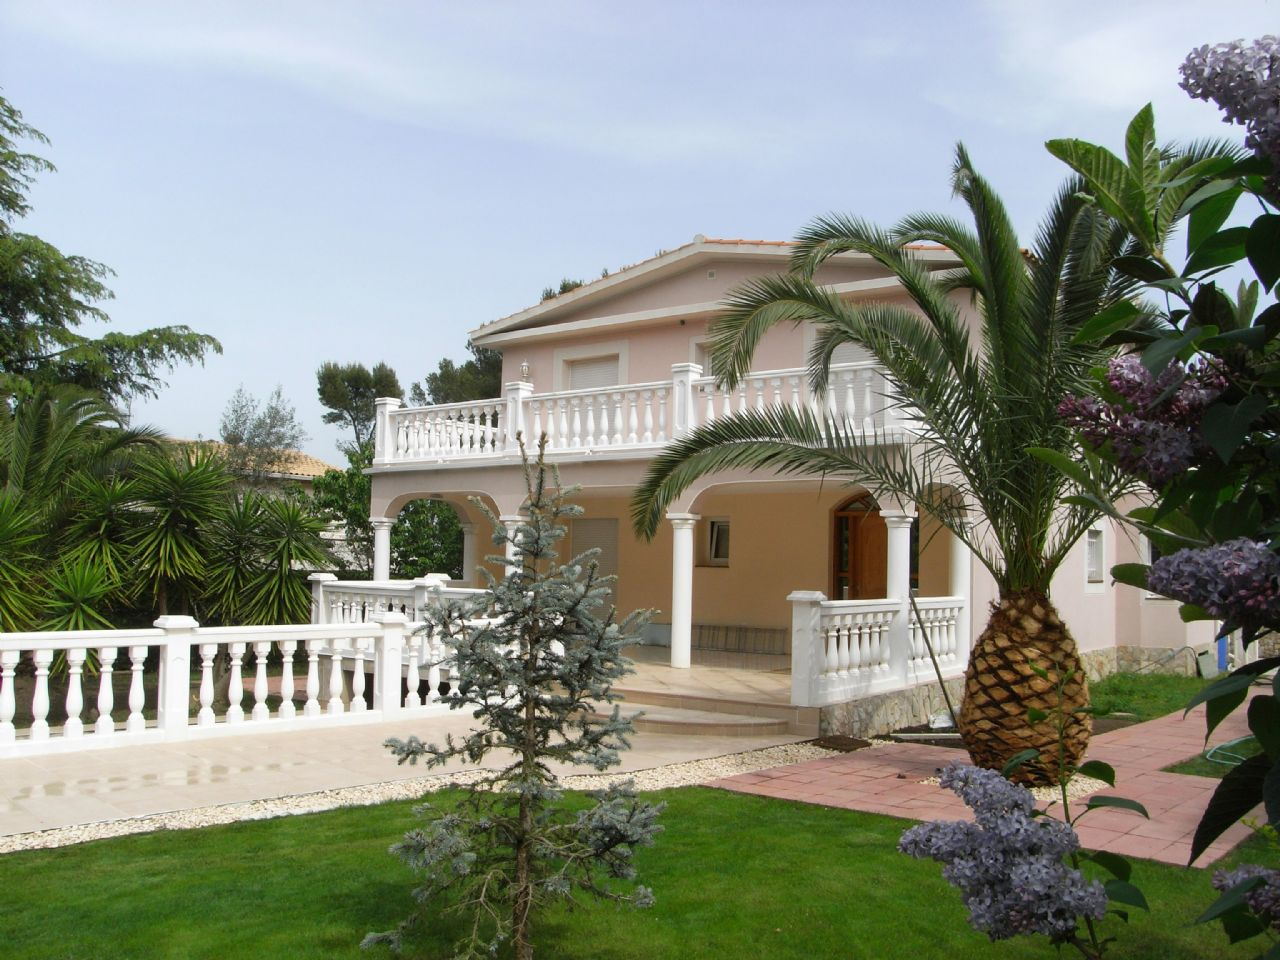 Villa de Lujo en Platja d'Aro, torre valentina, venta